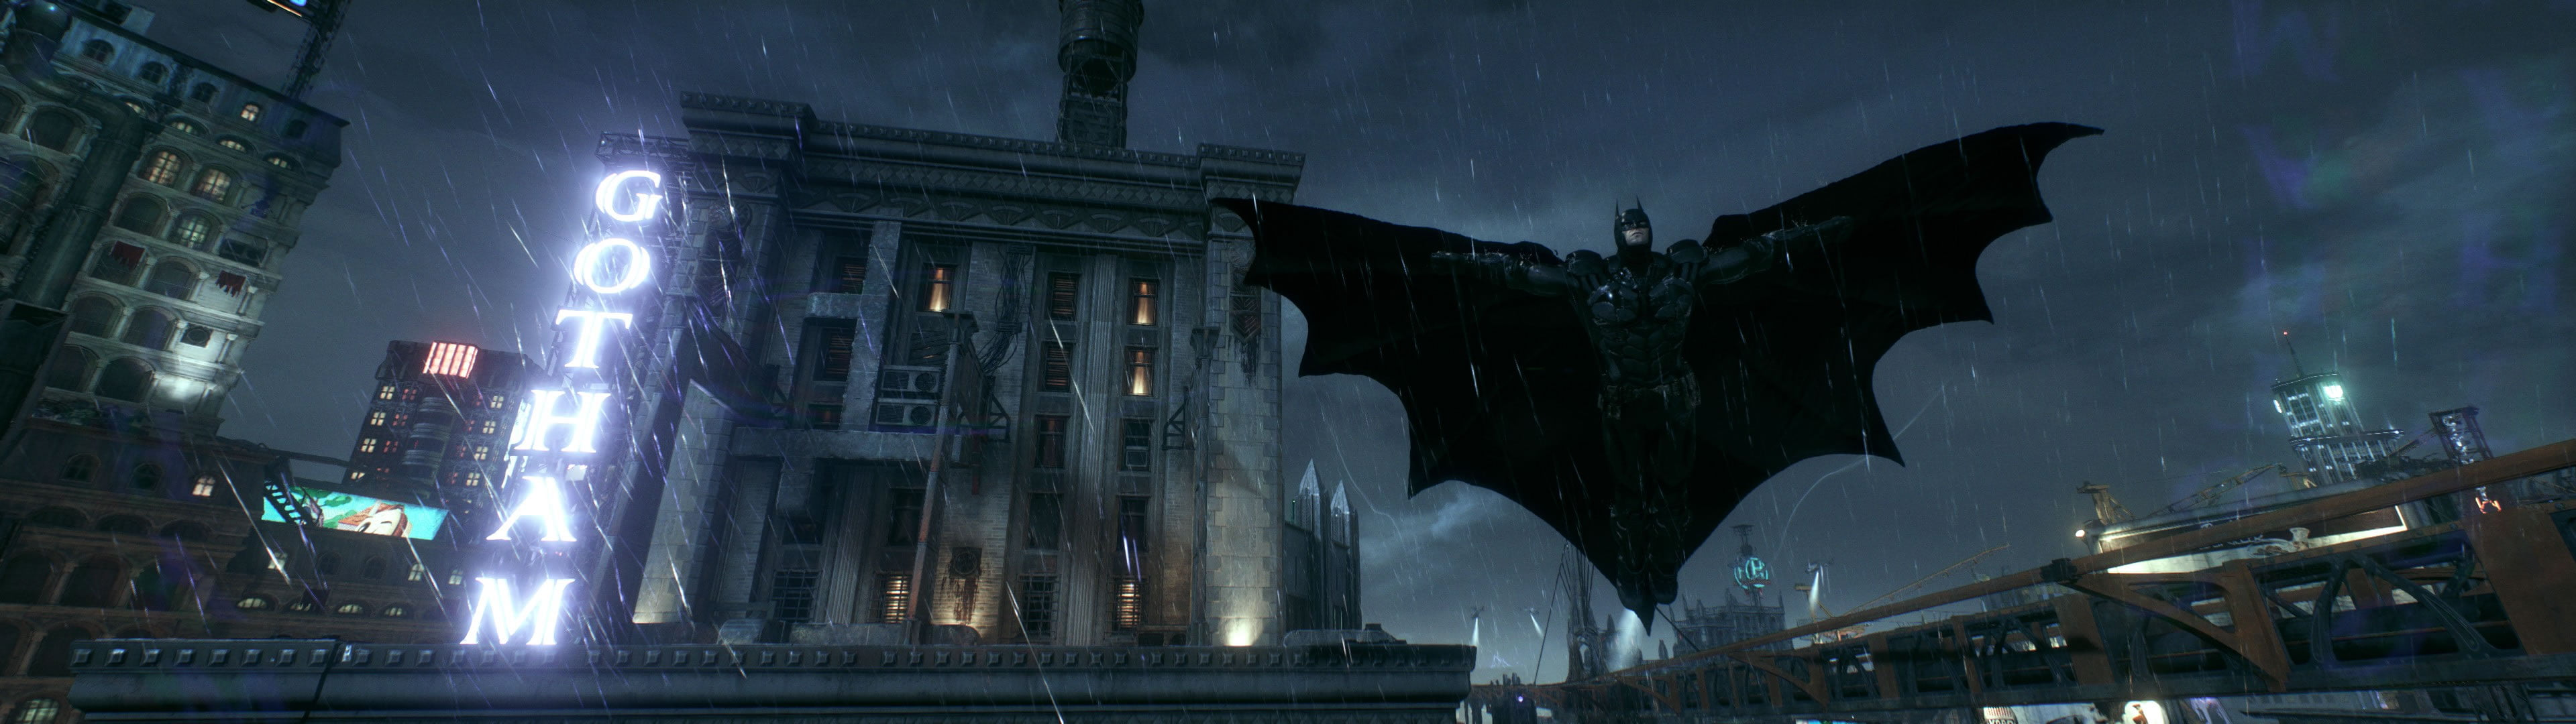 besplatne pozadine za dva monitora batman arkham knight